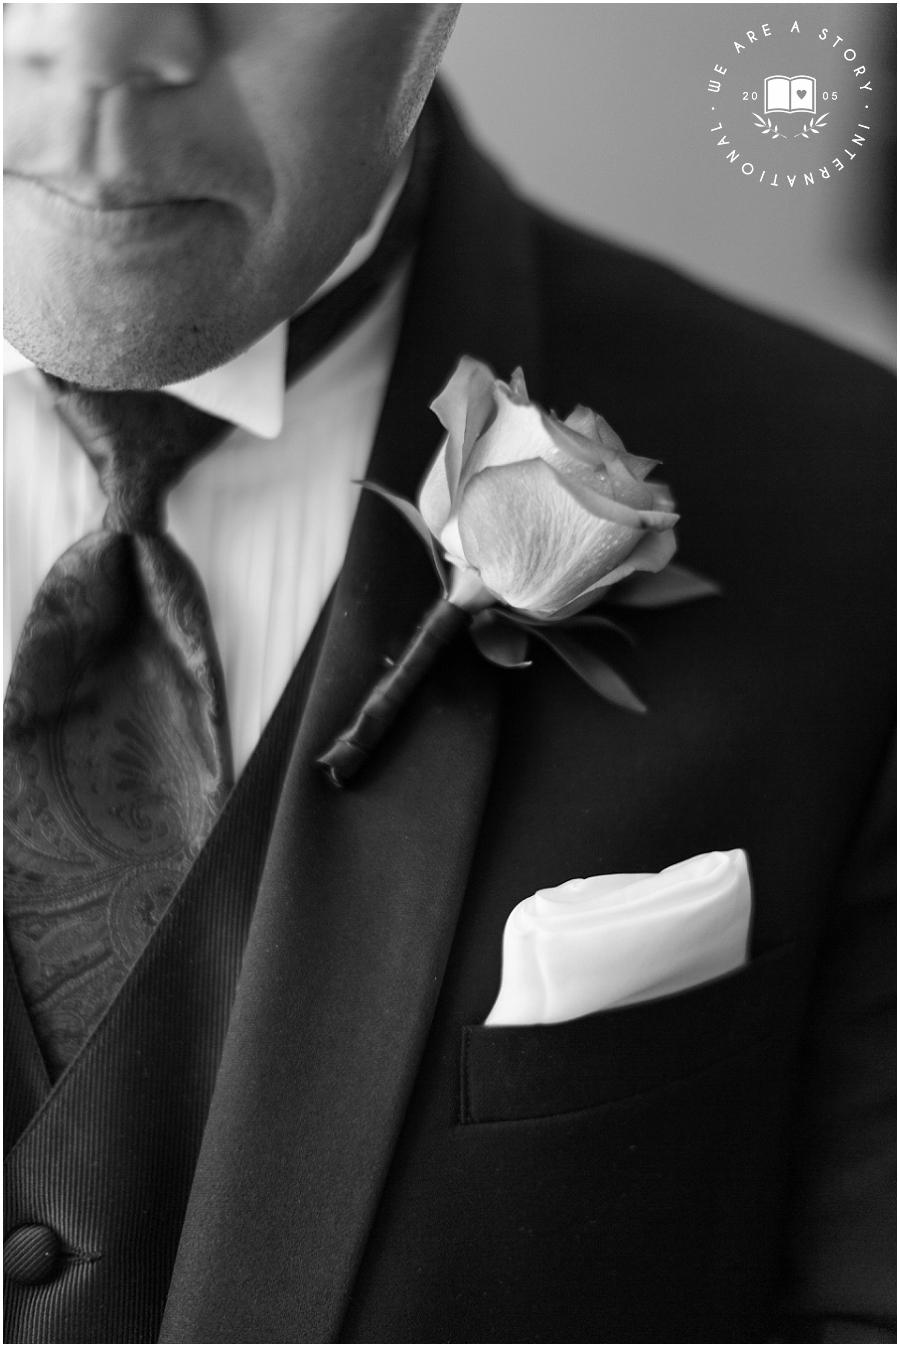 Four Seasons wedding photographer Las Vegas _ We Are A Story wedding photographer_2476.jpg